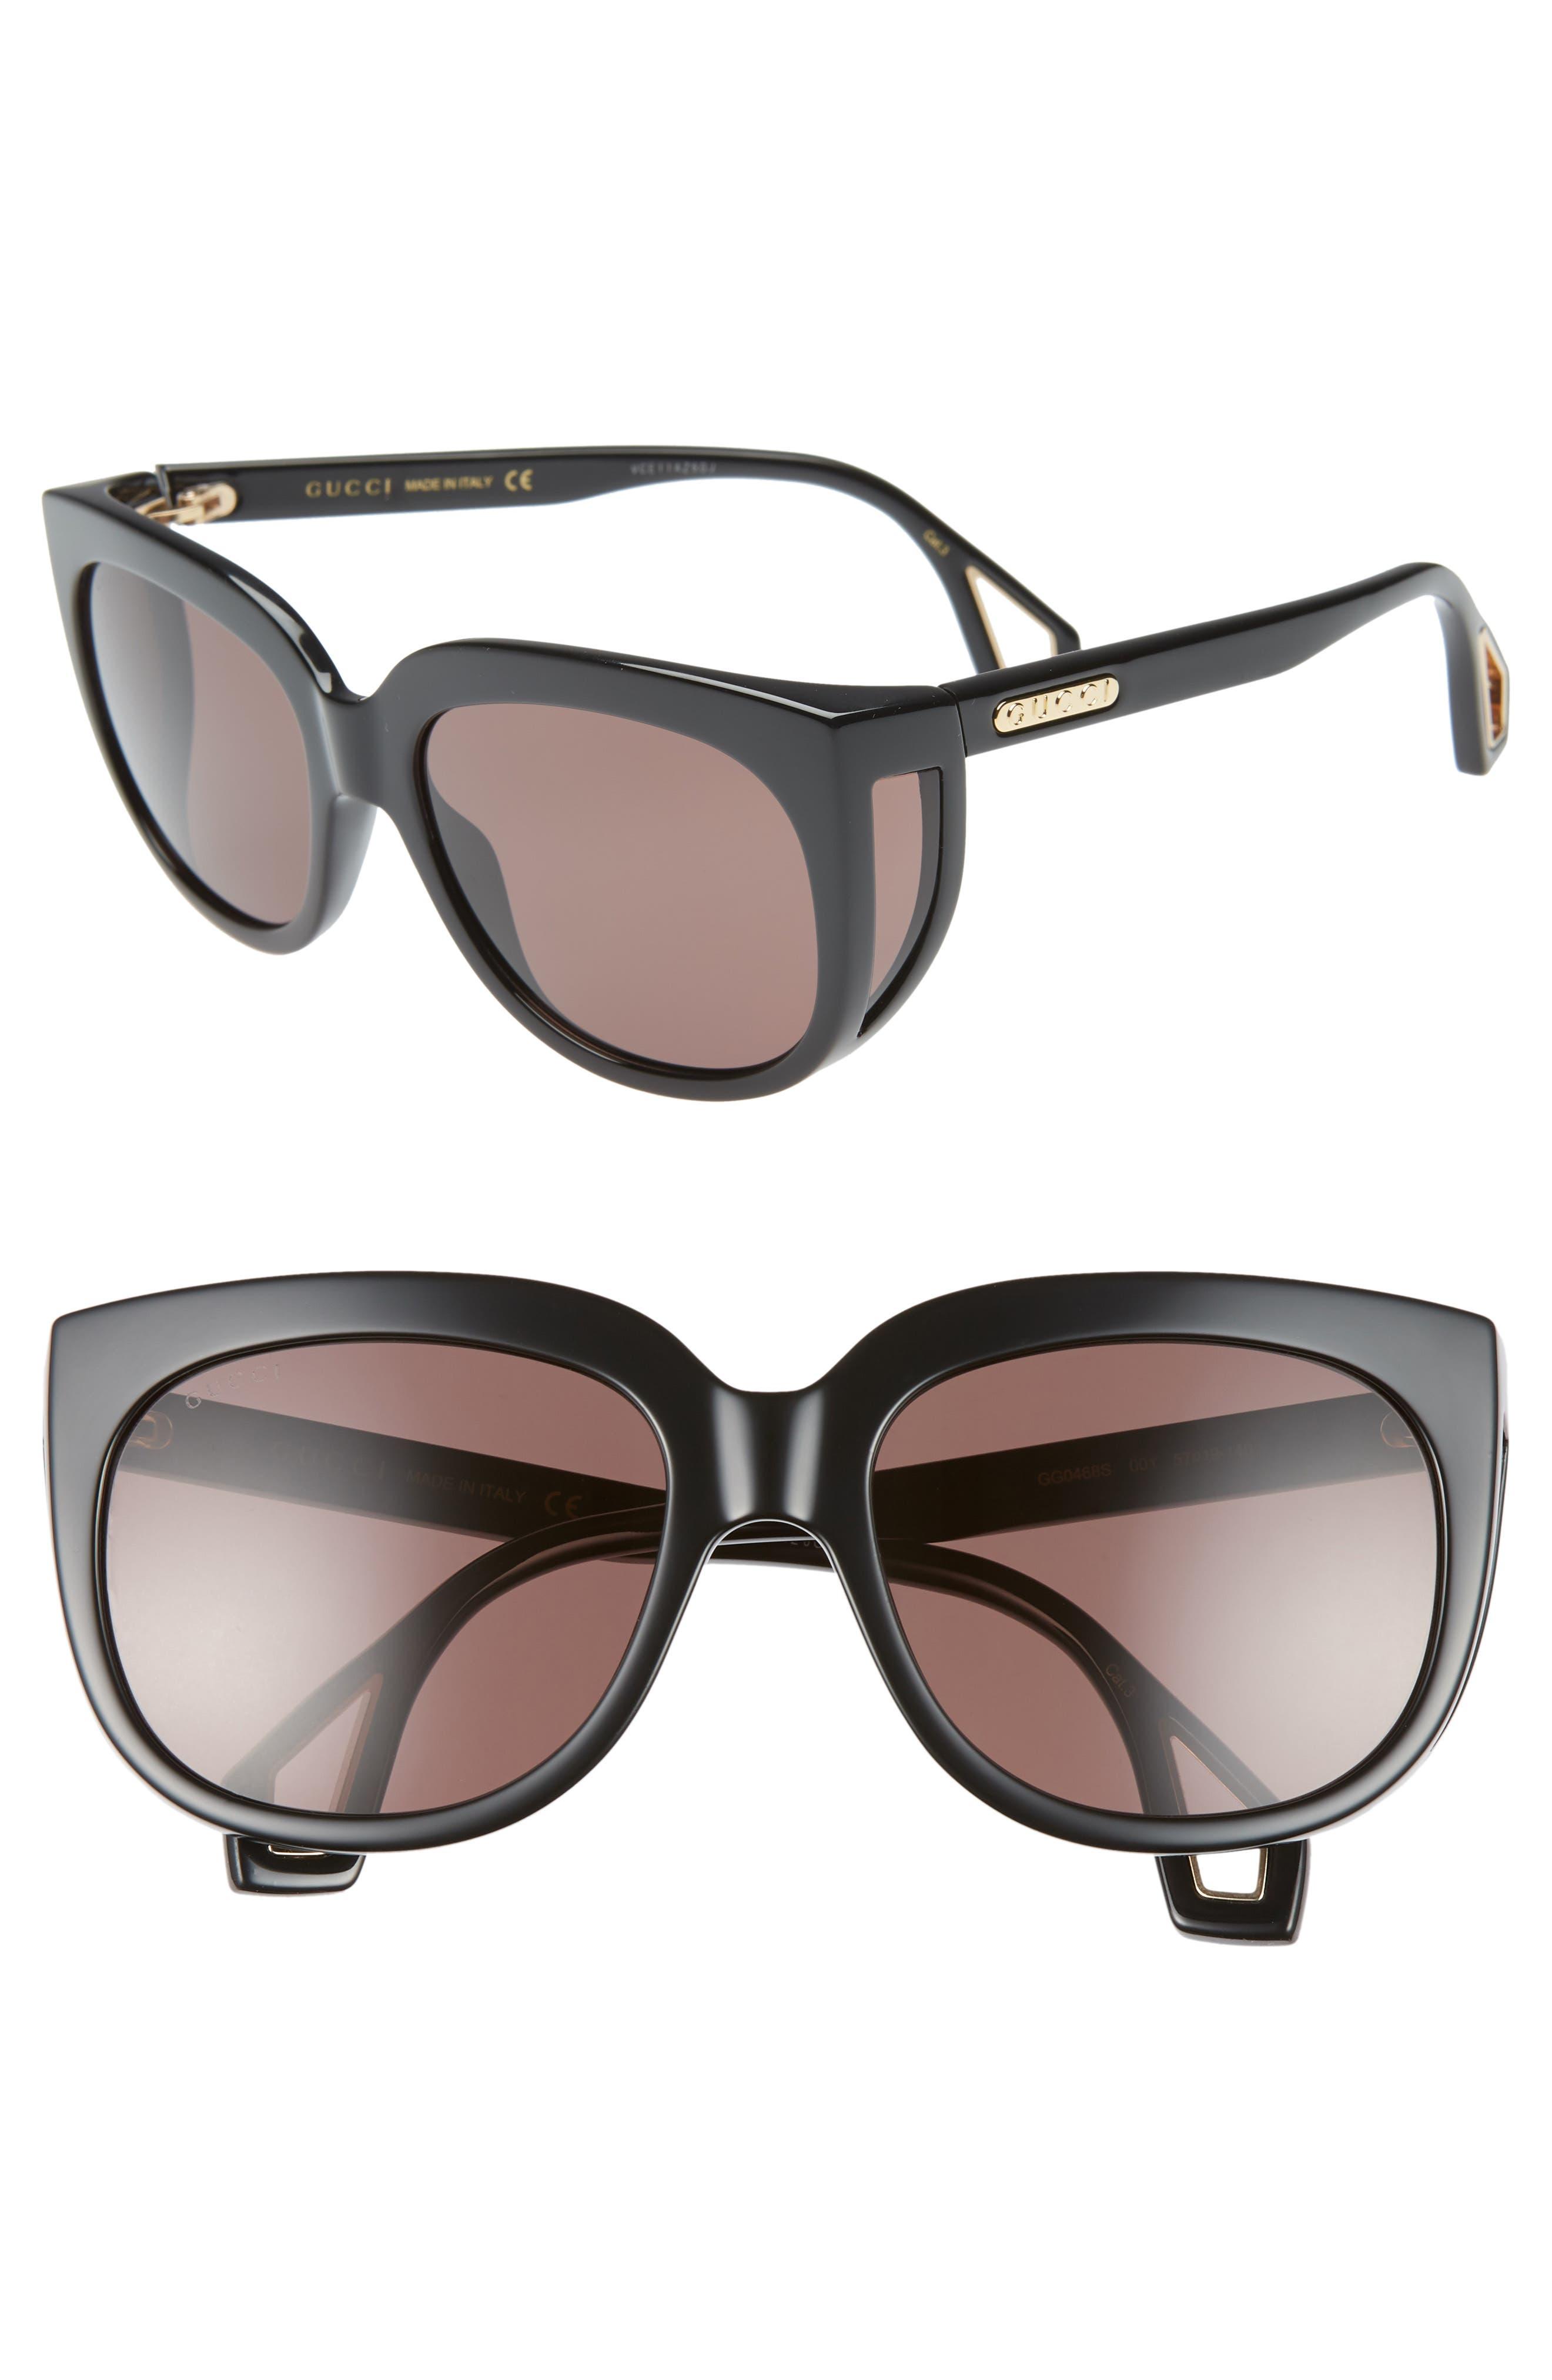 Gucci 57Mm Cat Eye Sunglasses - Shiny Blk Mazzu/brn Solid